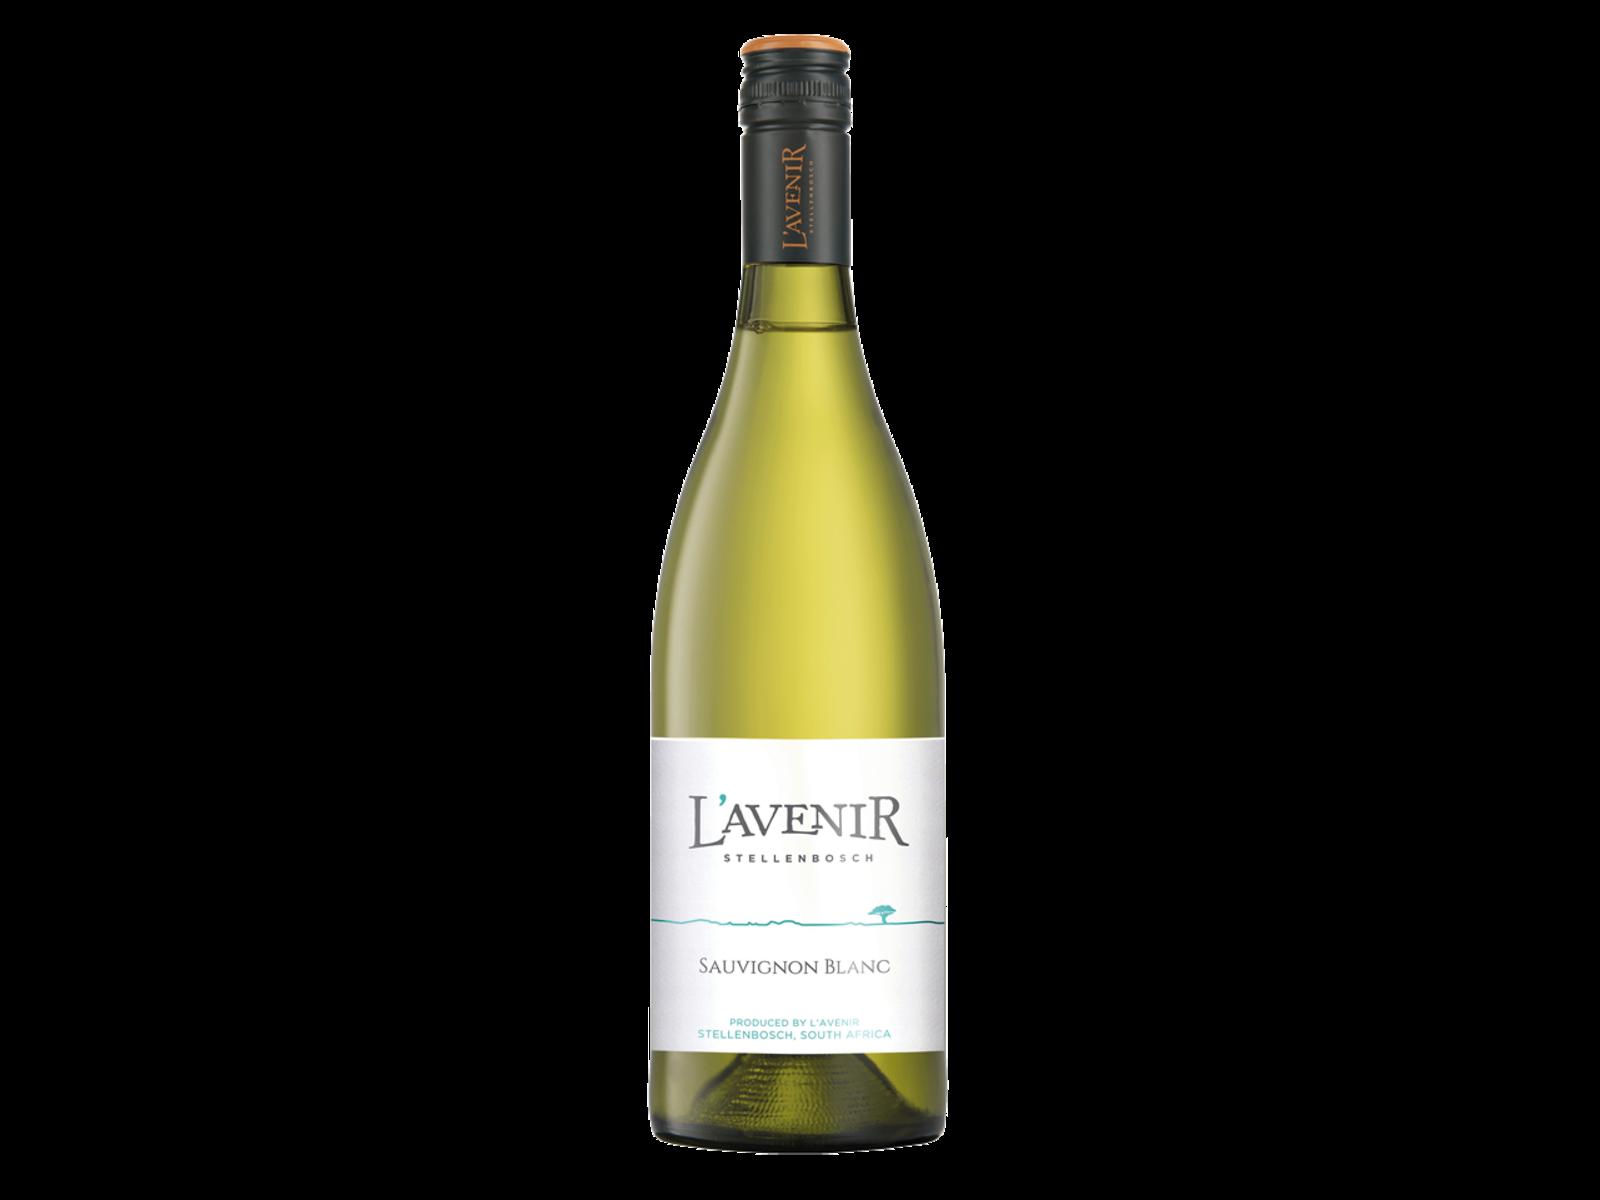 L'Avenir L'Avenir / Horizon / Sauvignon Blanc